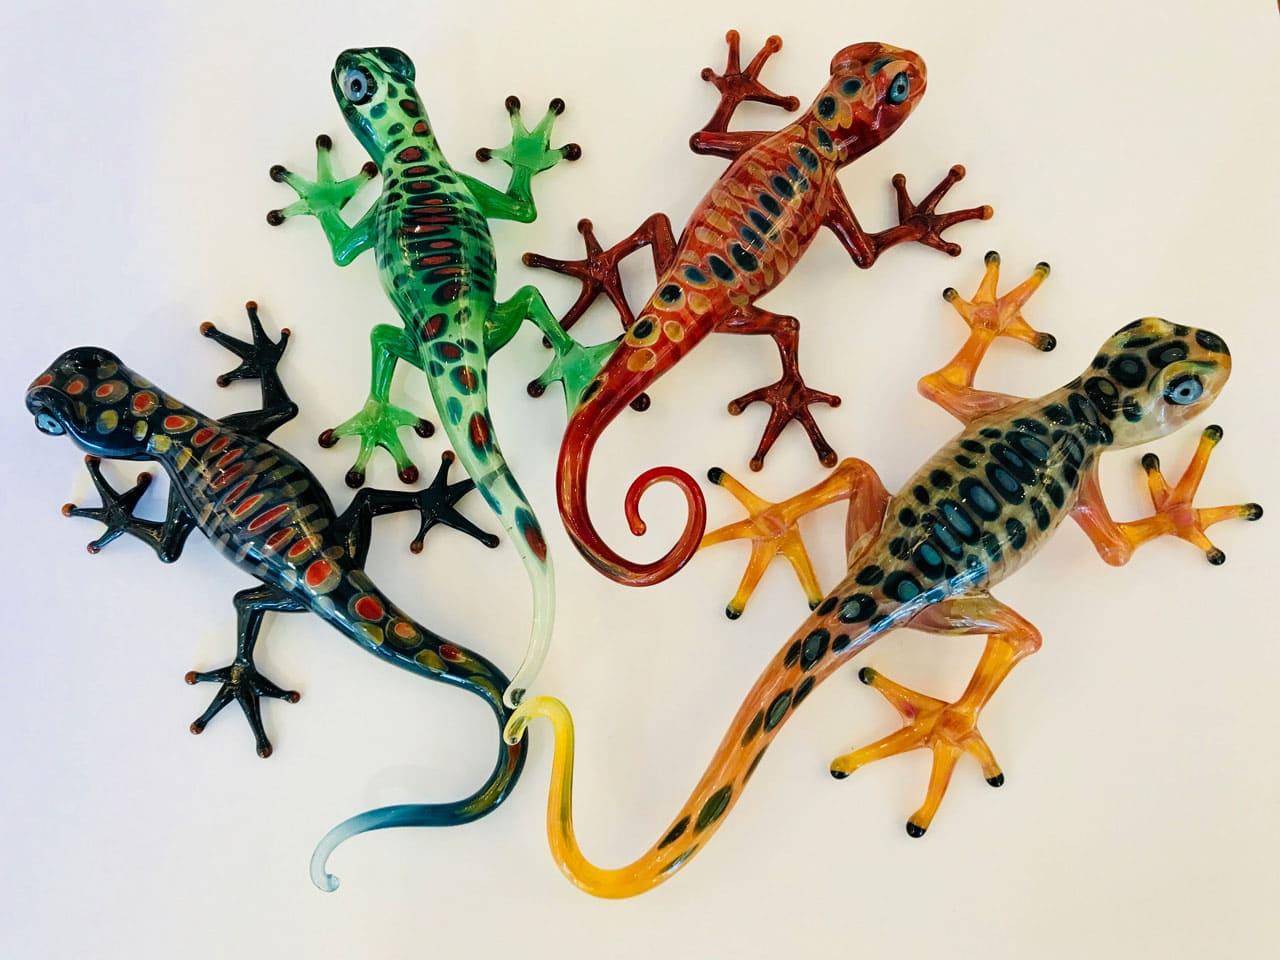 Assorted Handblown Glass Geckos by Chris Upp - Examples